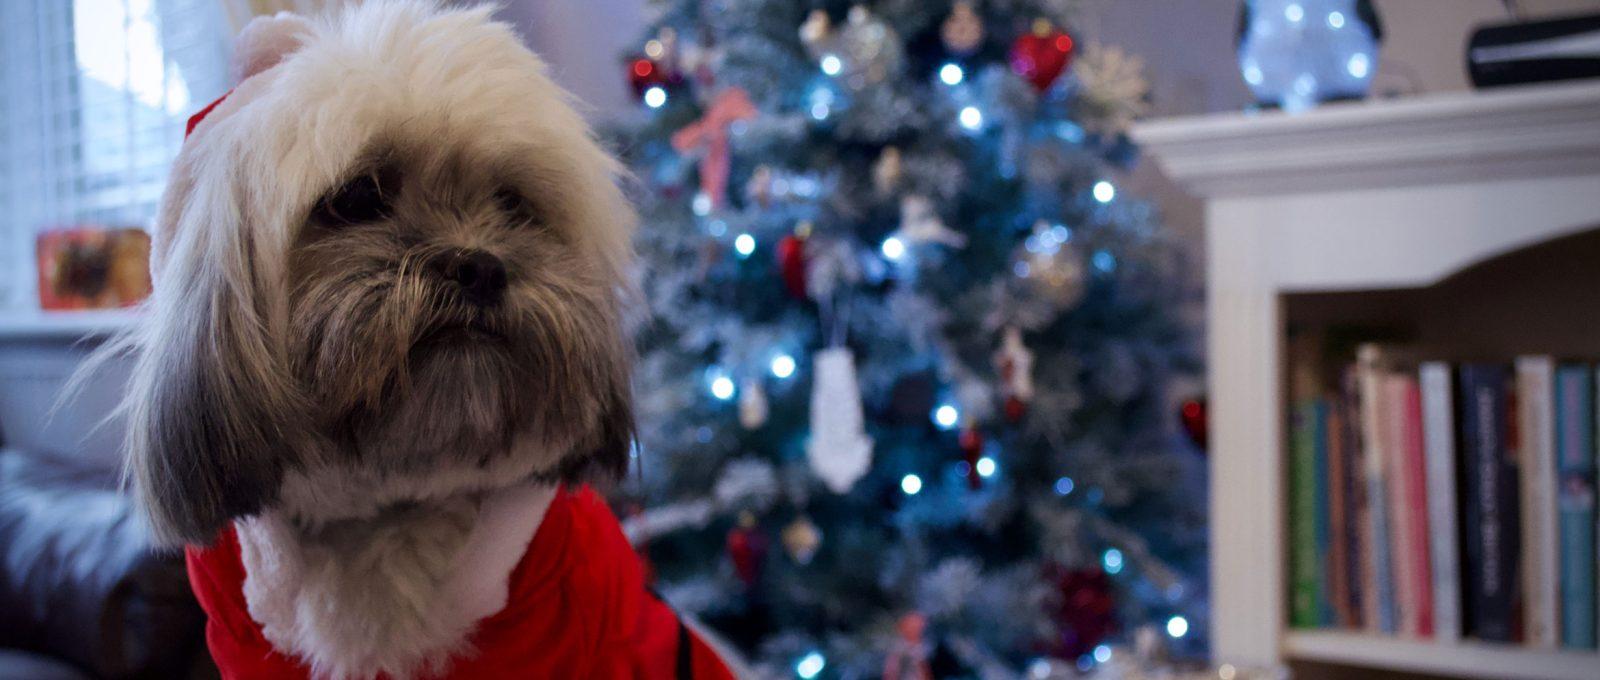 Puppy wearing Santa costume